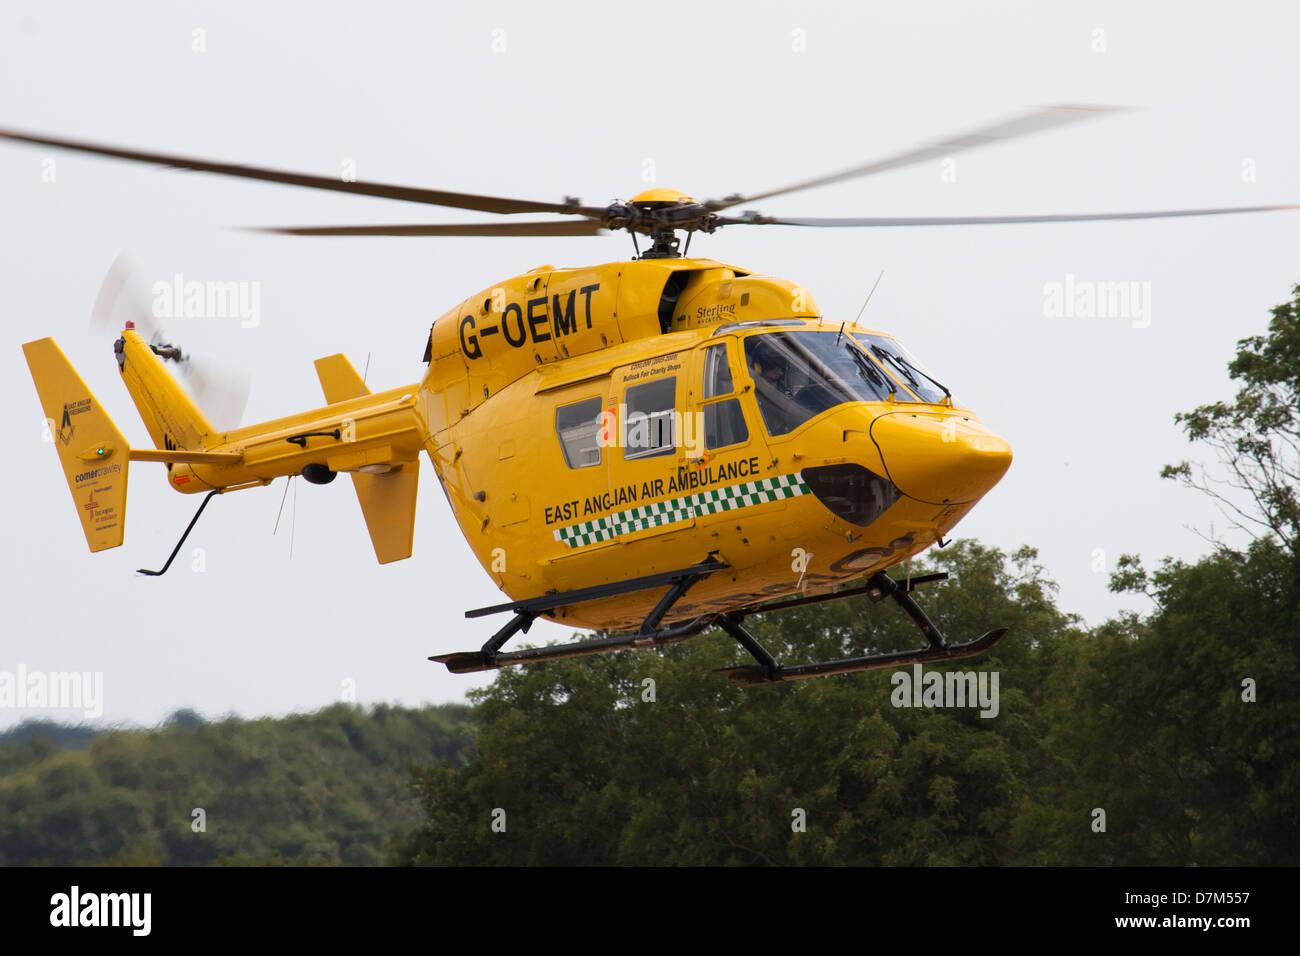 East Anglian Air Ambulance landing - Stock Image